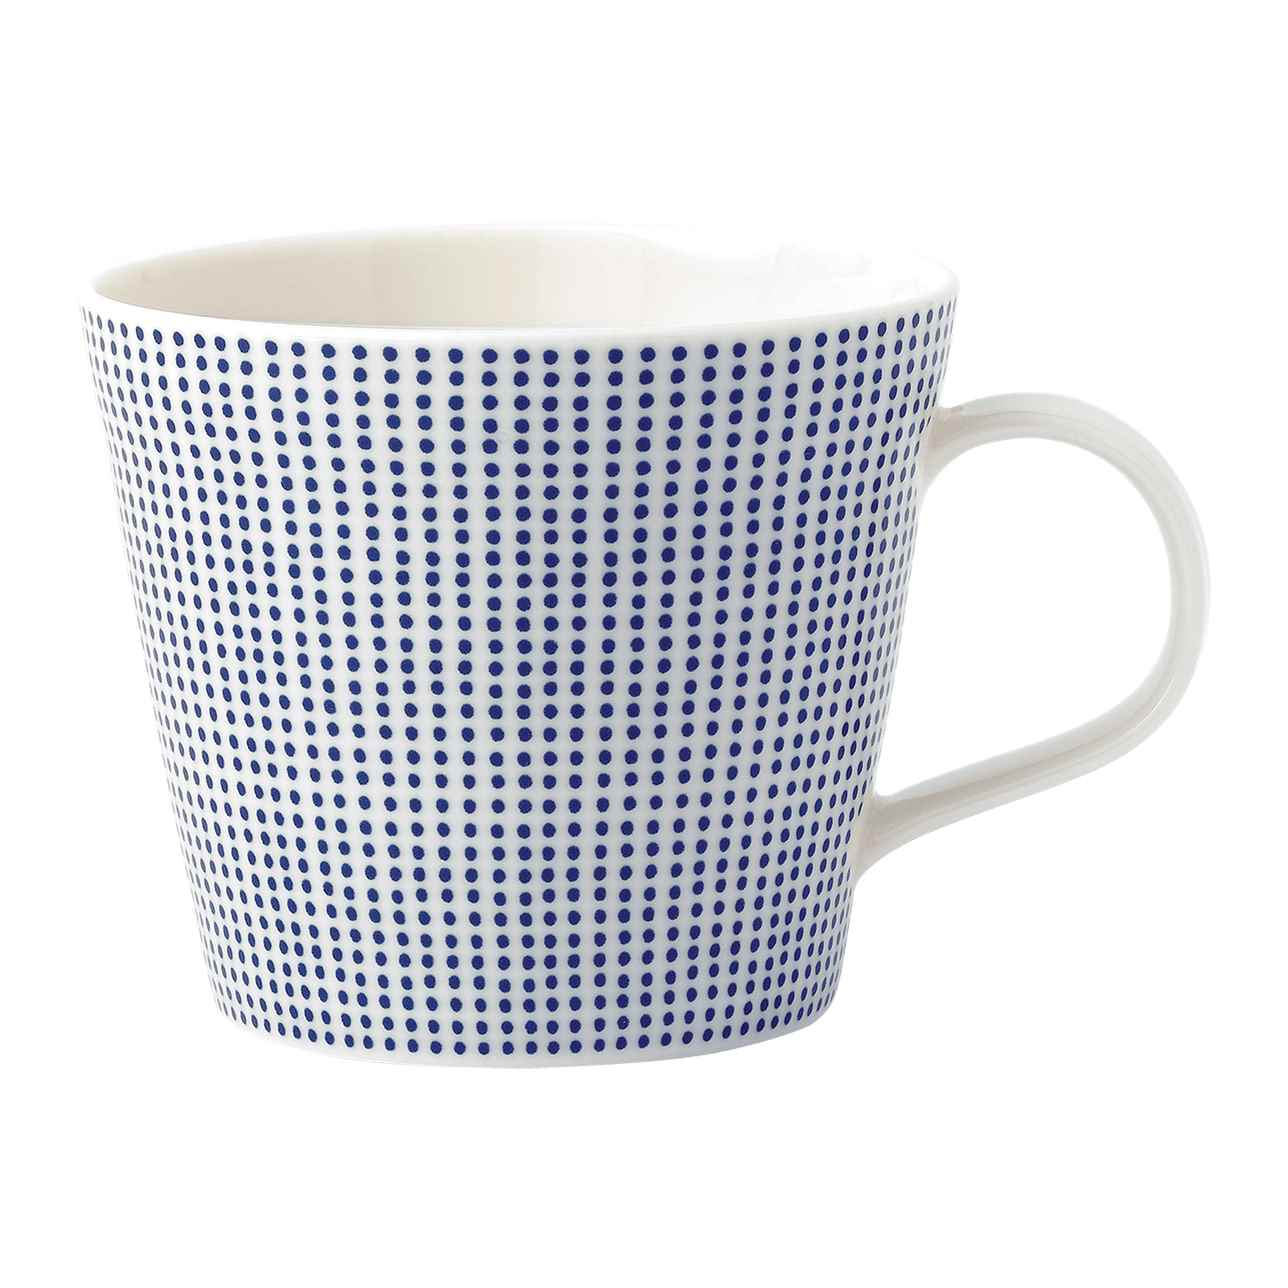 Pacific Blue Dots Mug